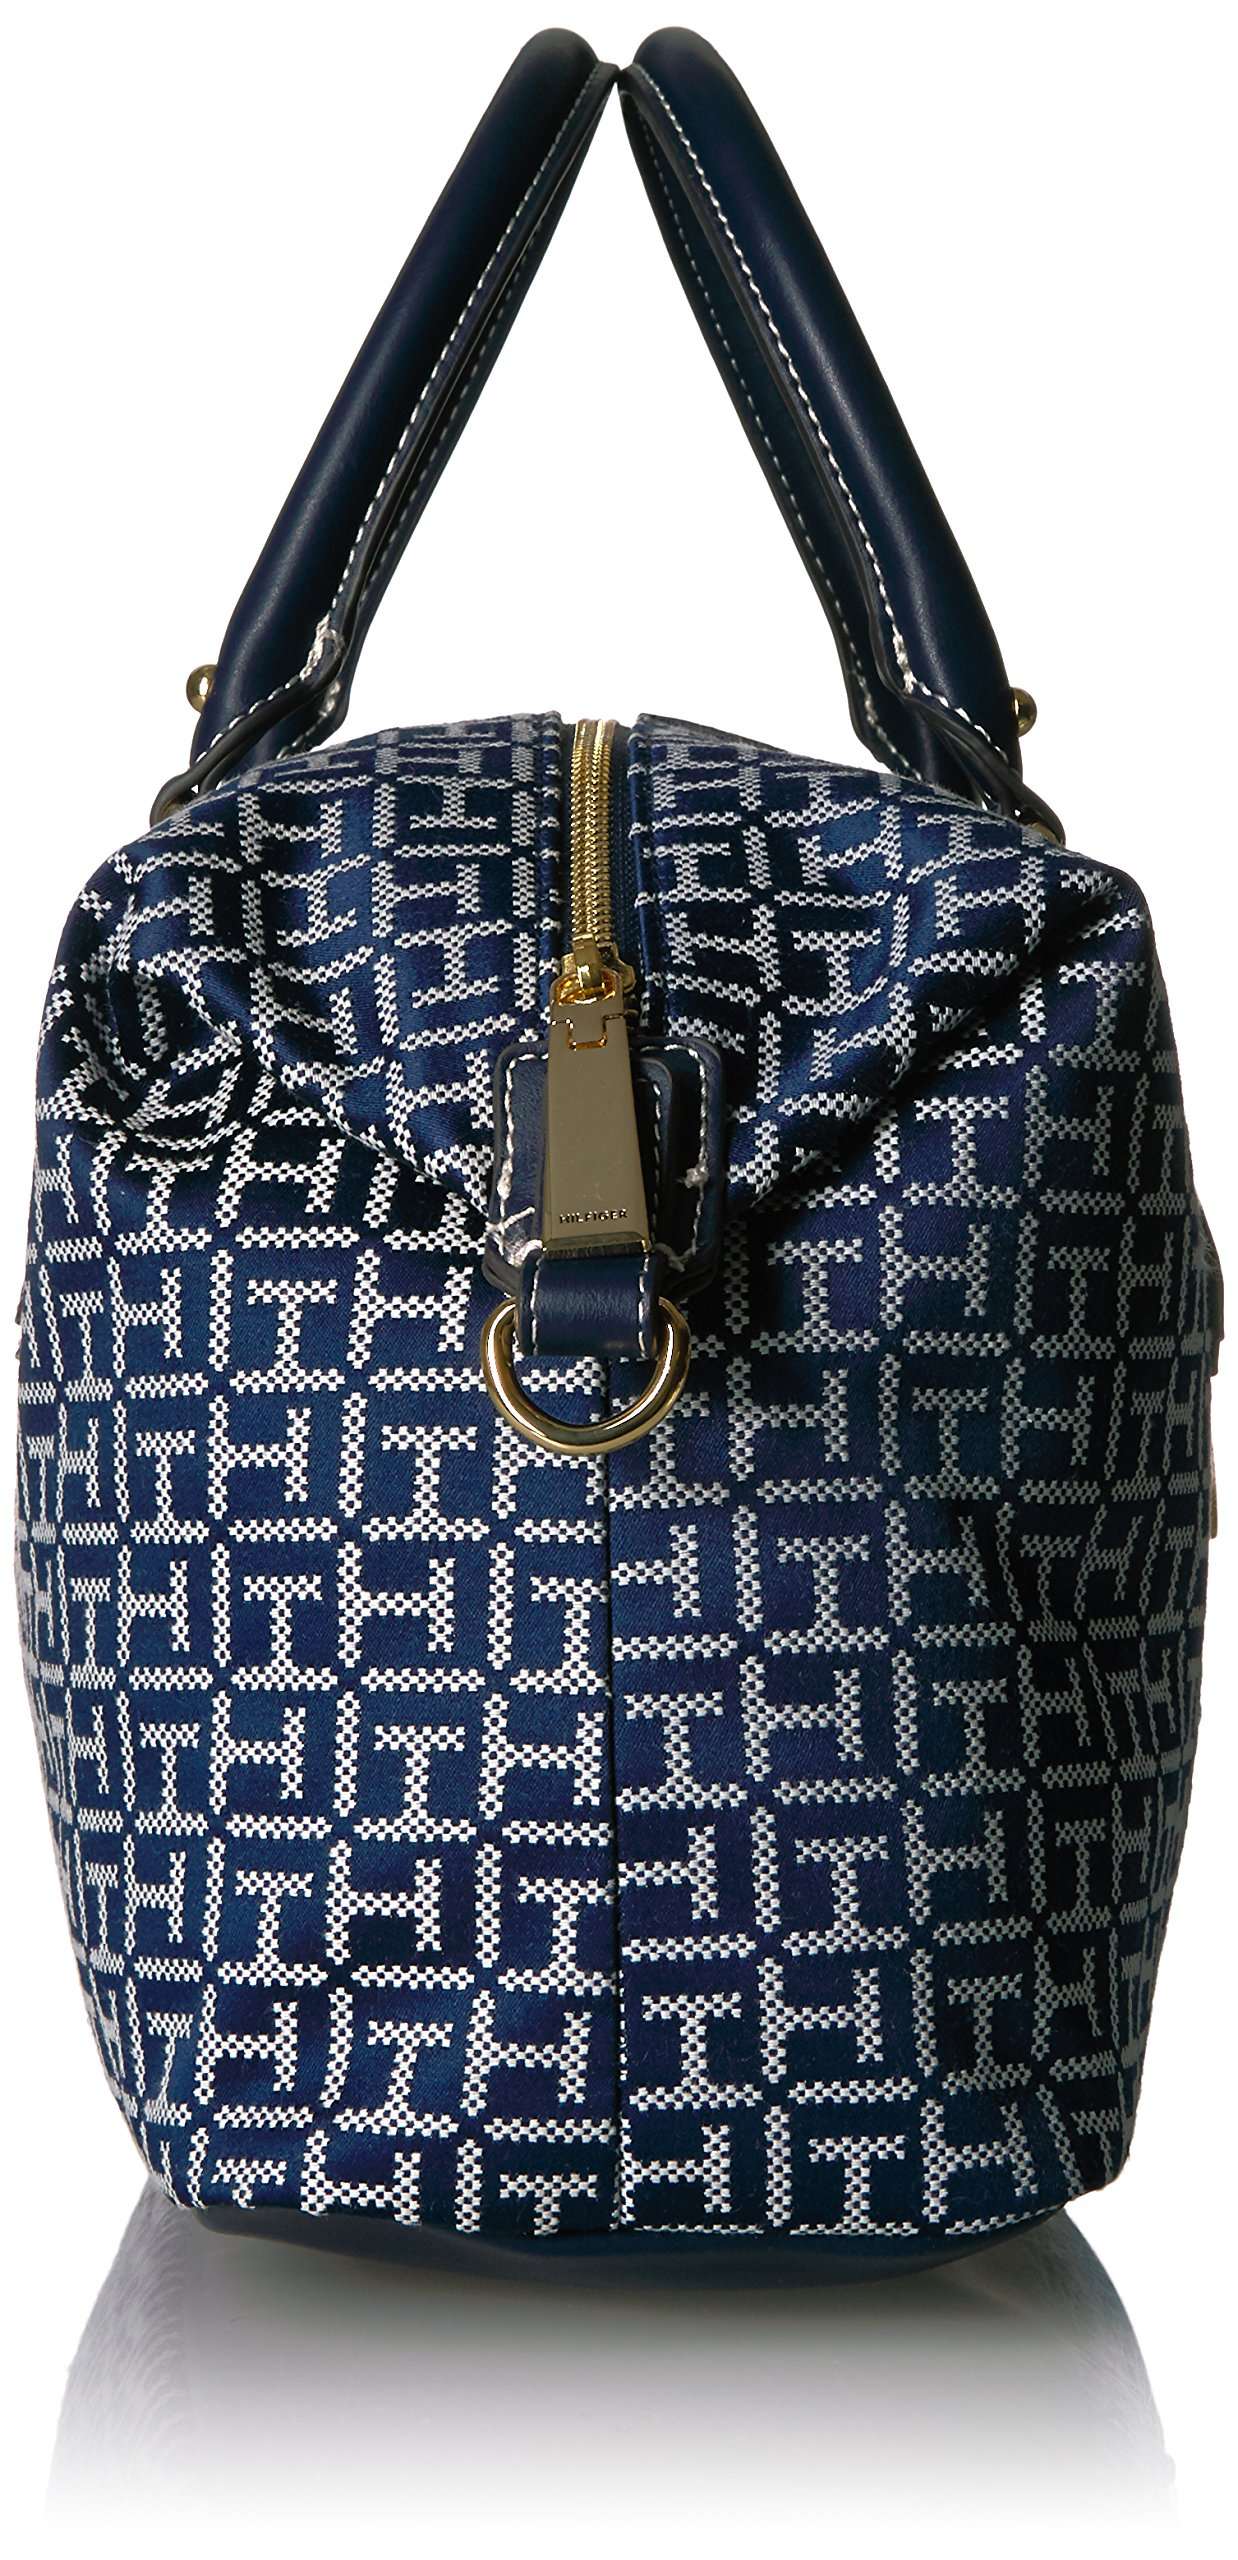 Tommy Hilfiger Handbag for Women Jaden Satchel, Navy/White by Tommy Hilfiger (Image #3)